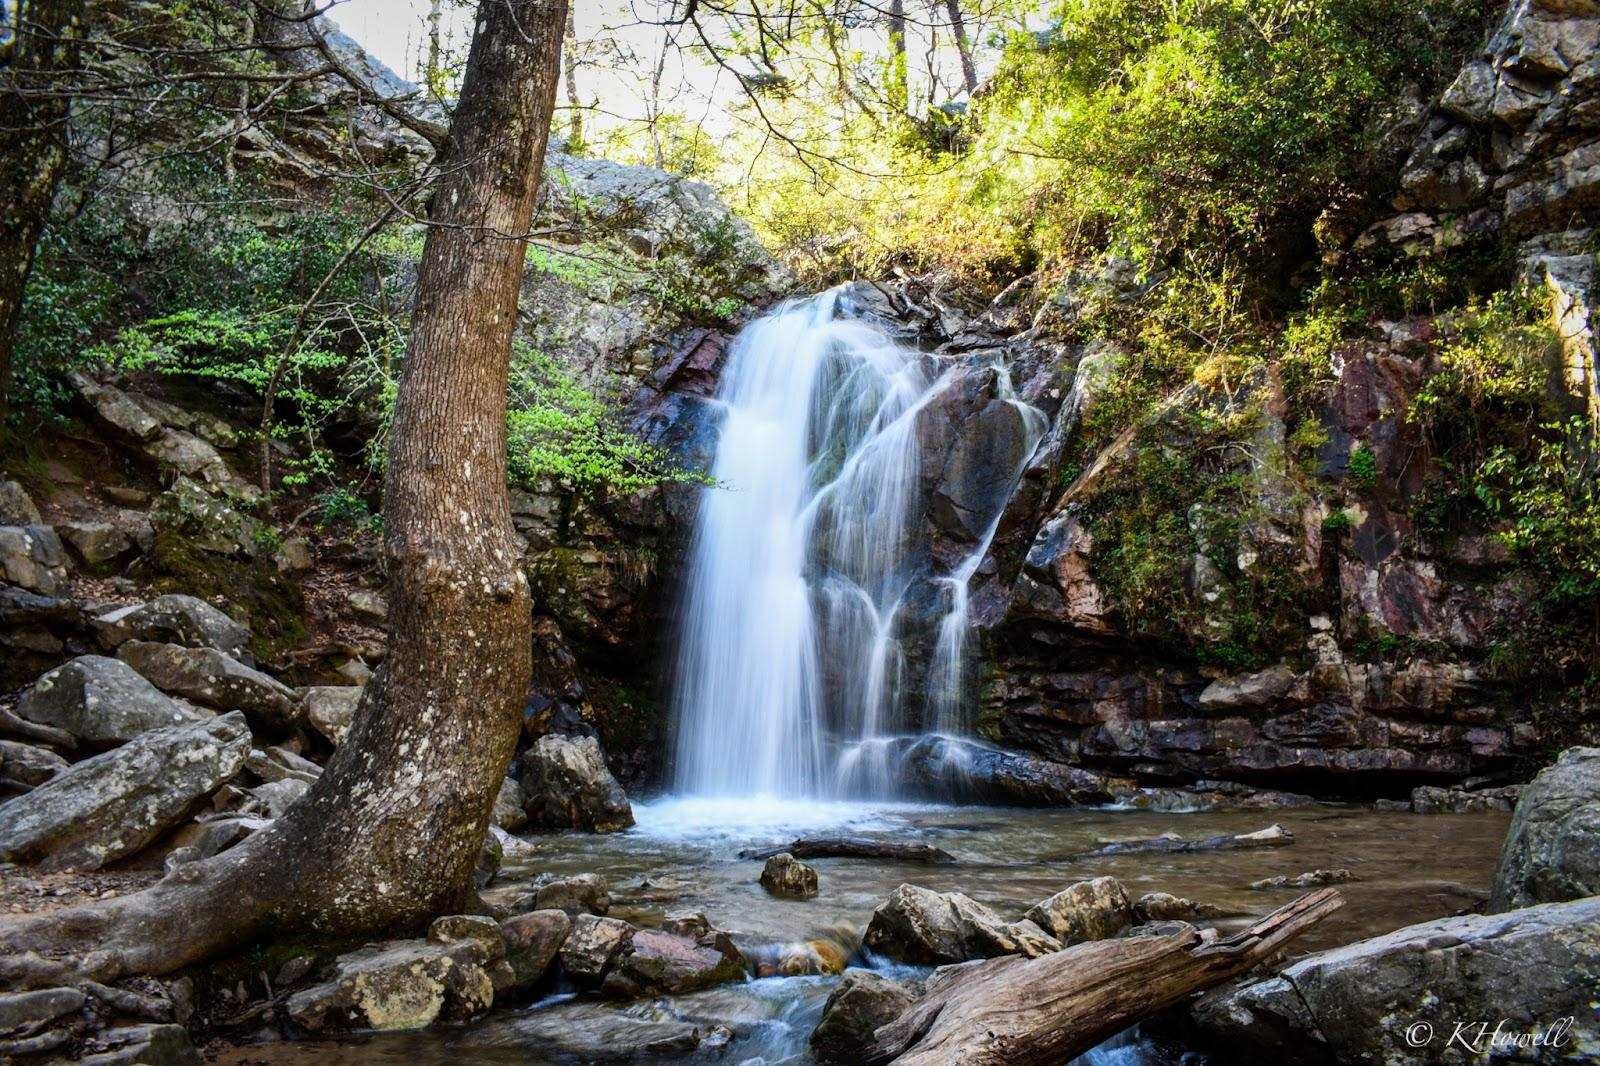 Peavine Falls at Oak Mountain State Park in Pelham, Alabama